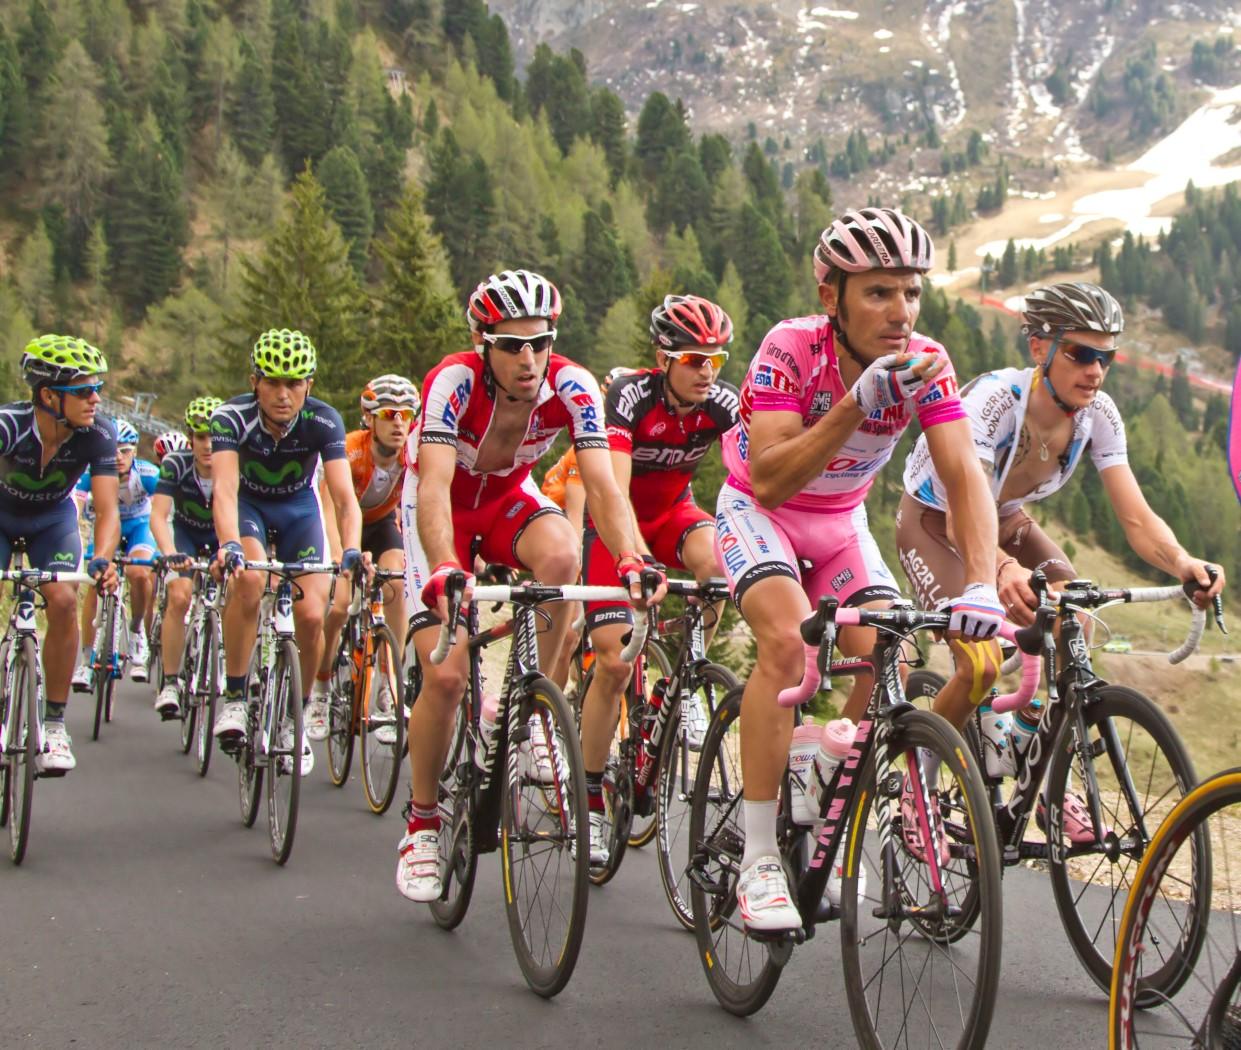 File:Giro d'Italia 2012, 072 pampeago rodriguez met ...